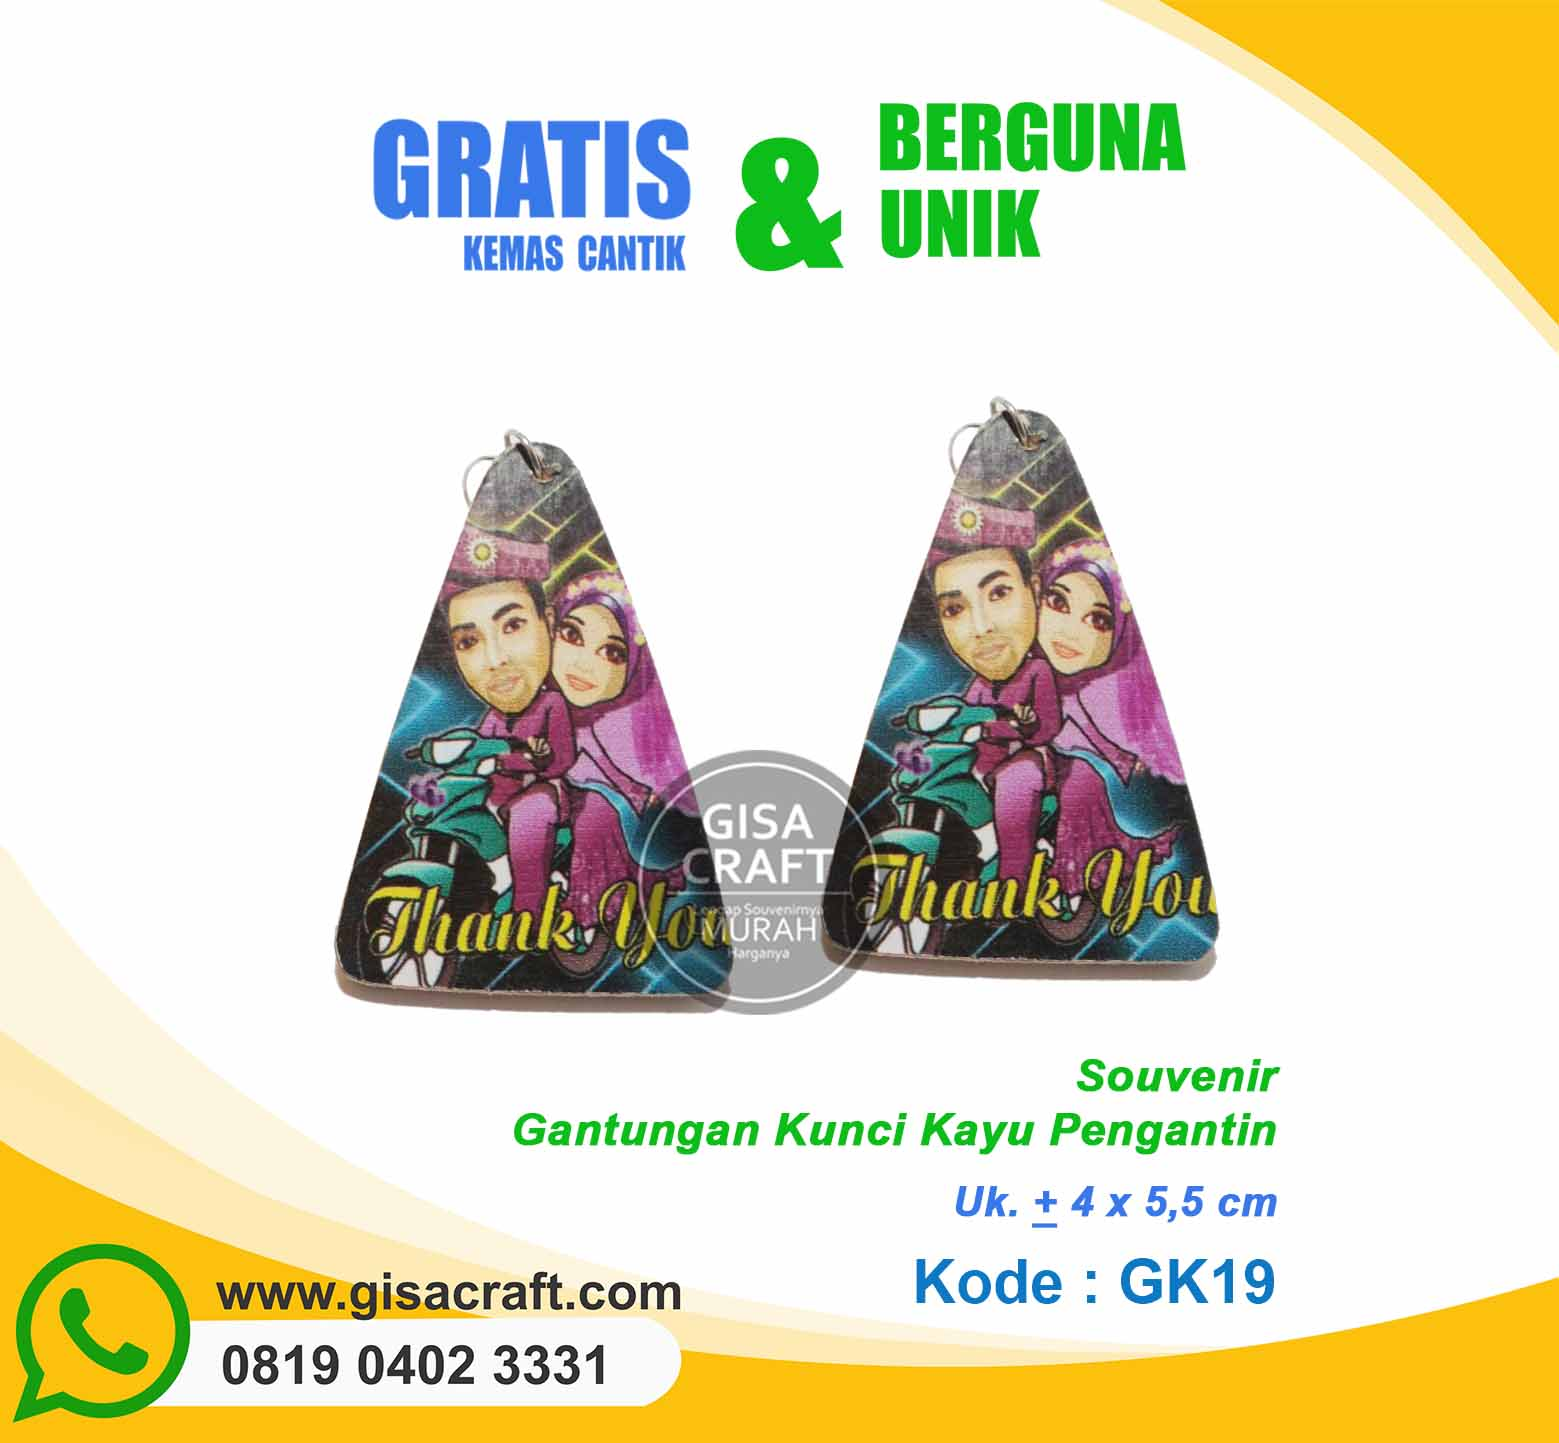 Souvenir Gantungan Kunci Kayu Pengantin GK19